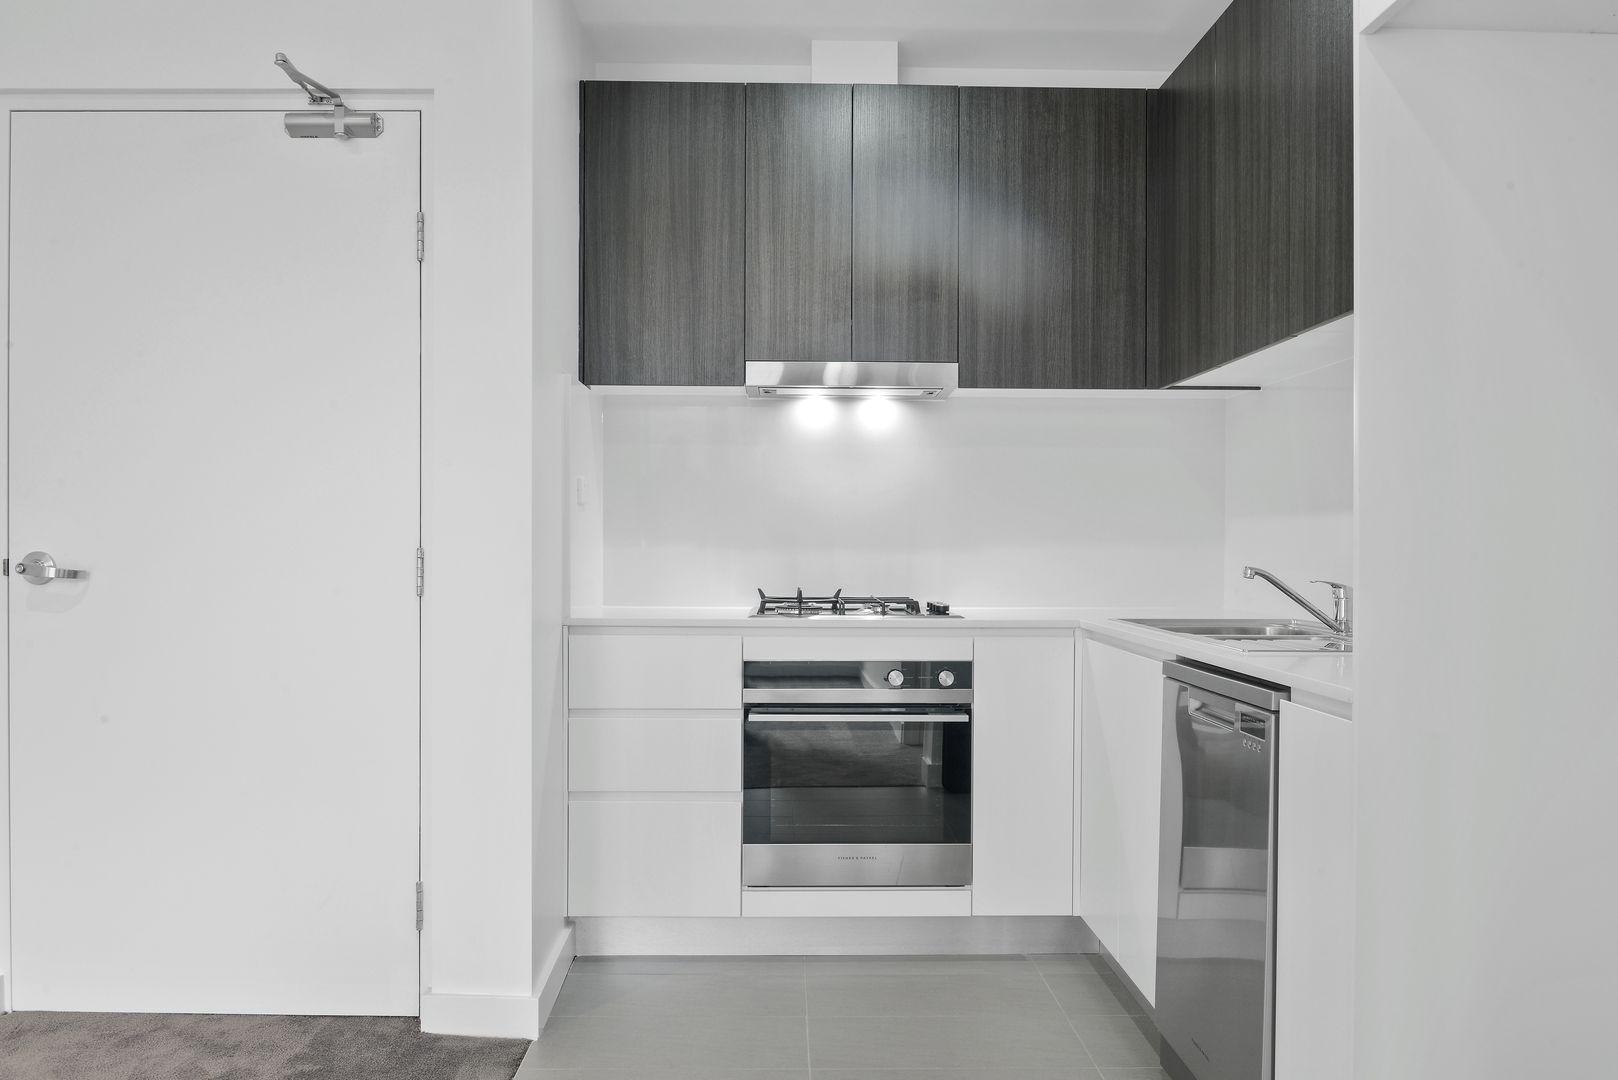 207/69 Courallie Avenue, Homebush West NSW 2140, Image 1